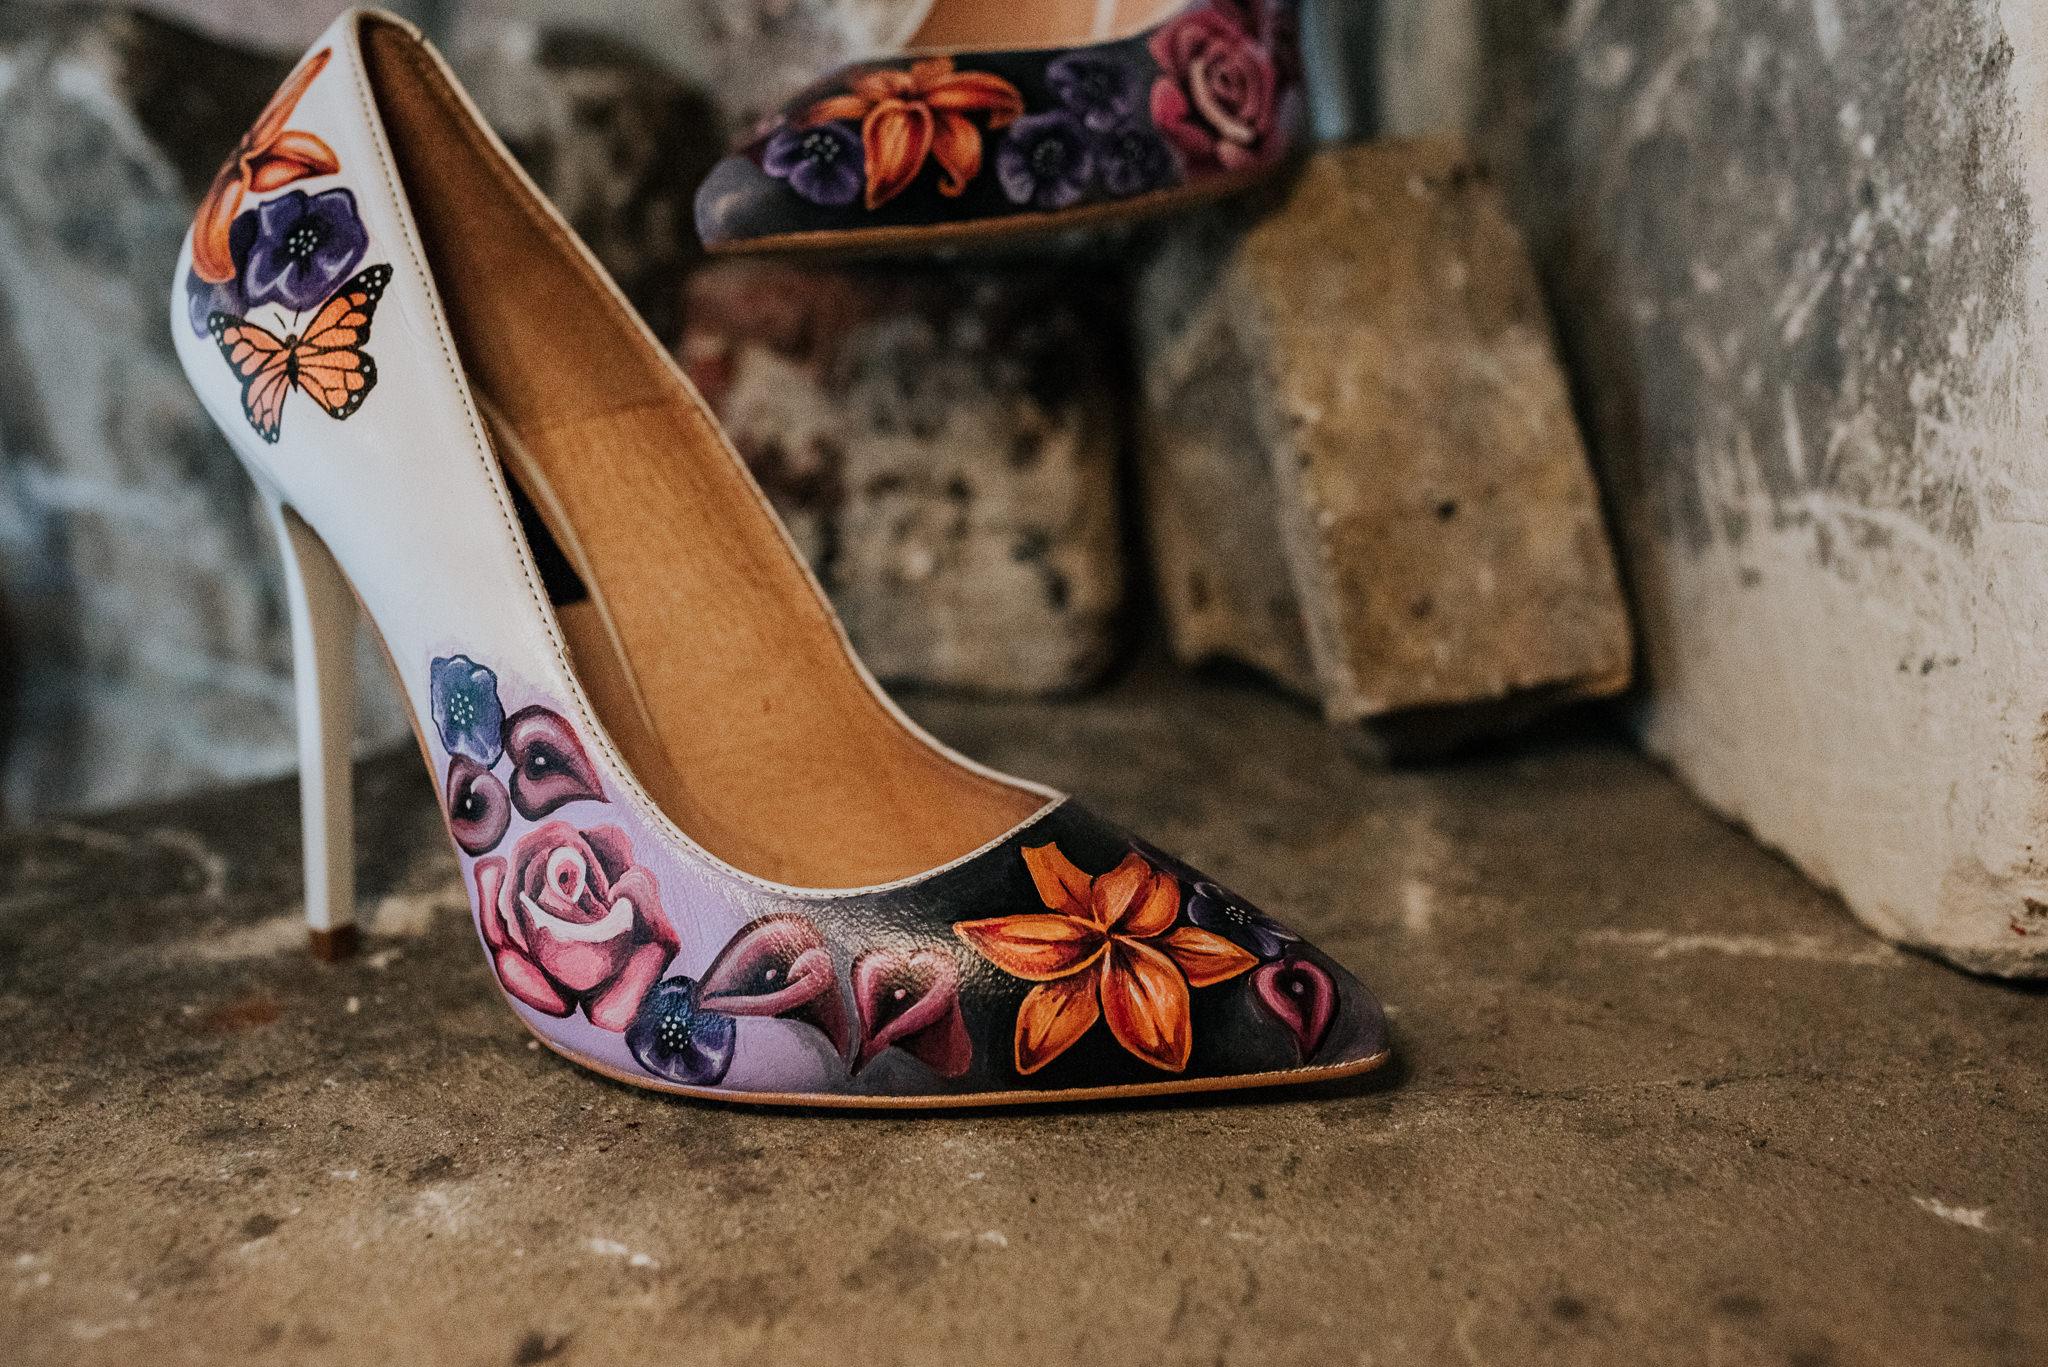 alternative chapel wedding- asylum london- unique london wedding venue- london wedding venue- Jenny Appleton Photography- hand painted wedding shoes- bespoke wedding shoes